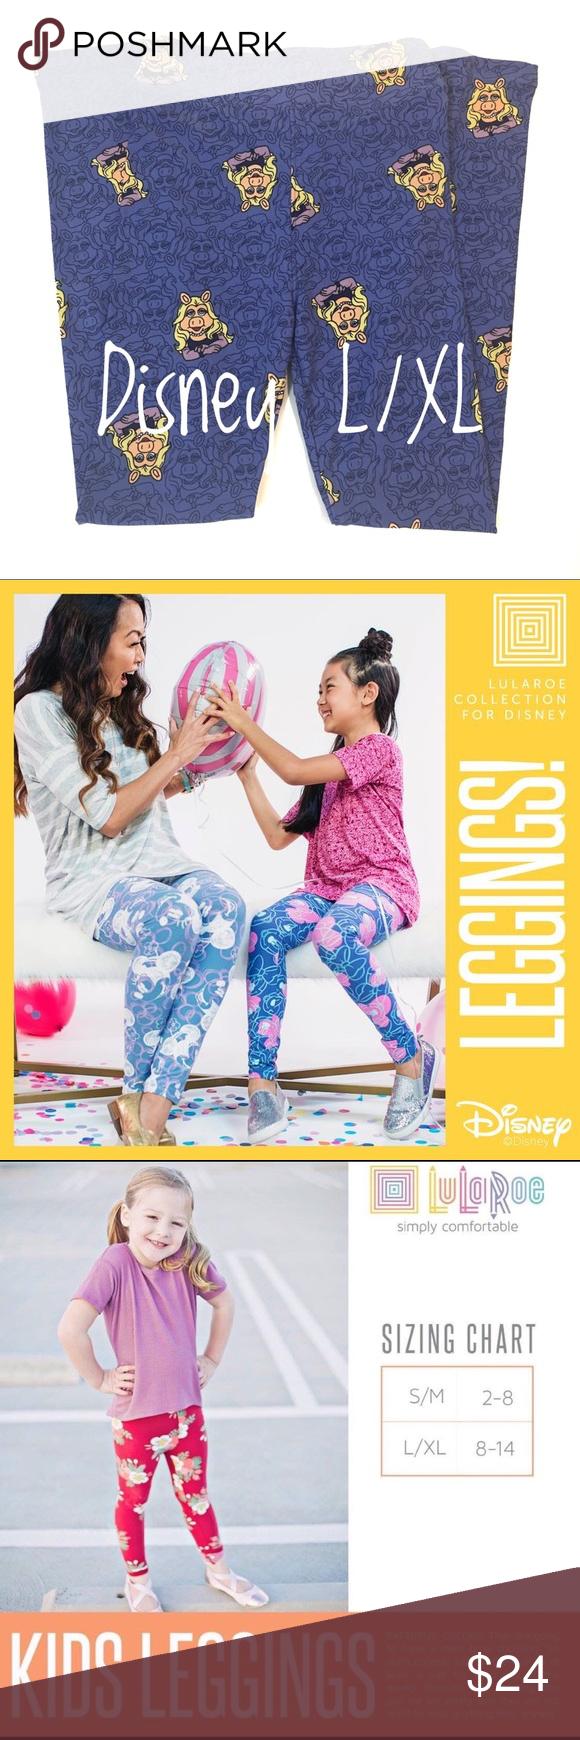 Kids Disney LuLaRoe Miss Piggy Leggings! NWT L/XL LuLaRoe